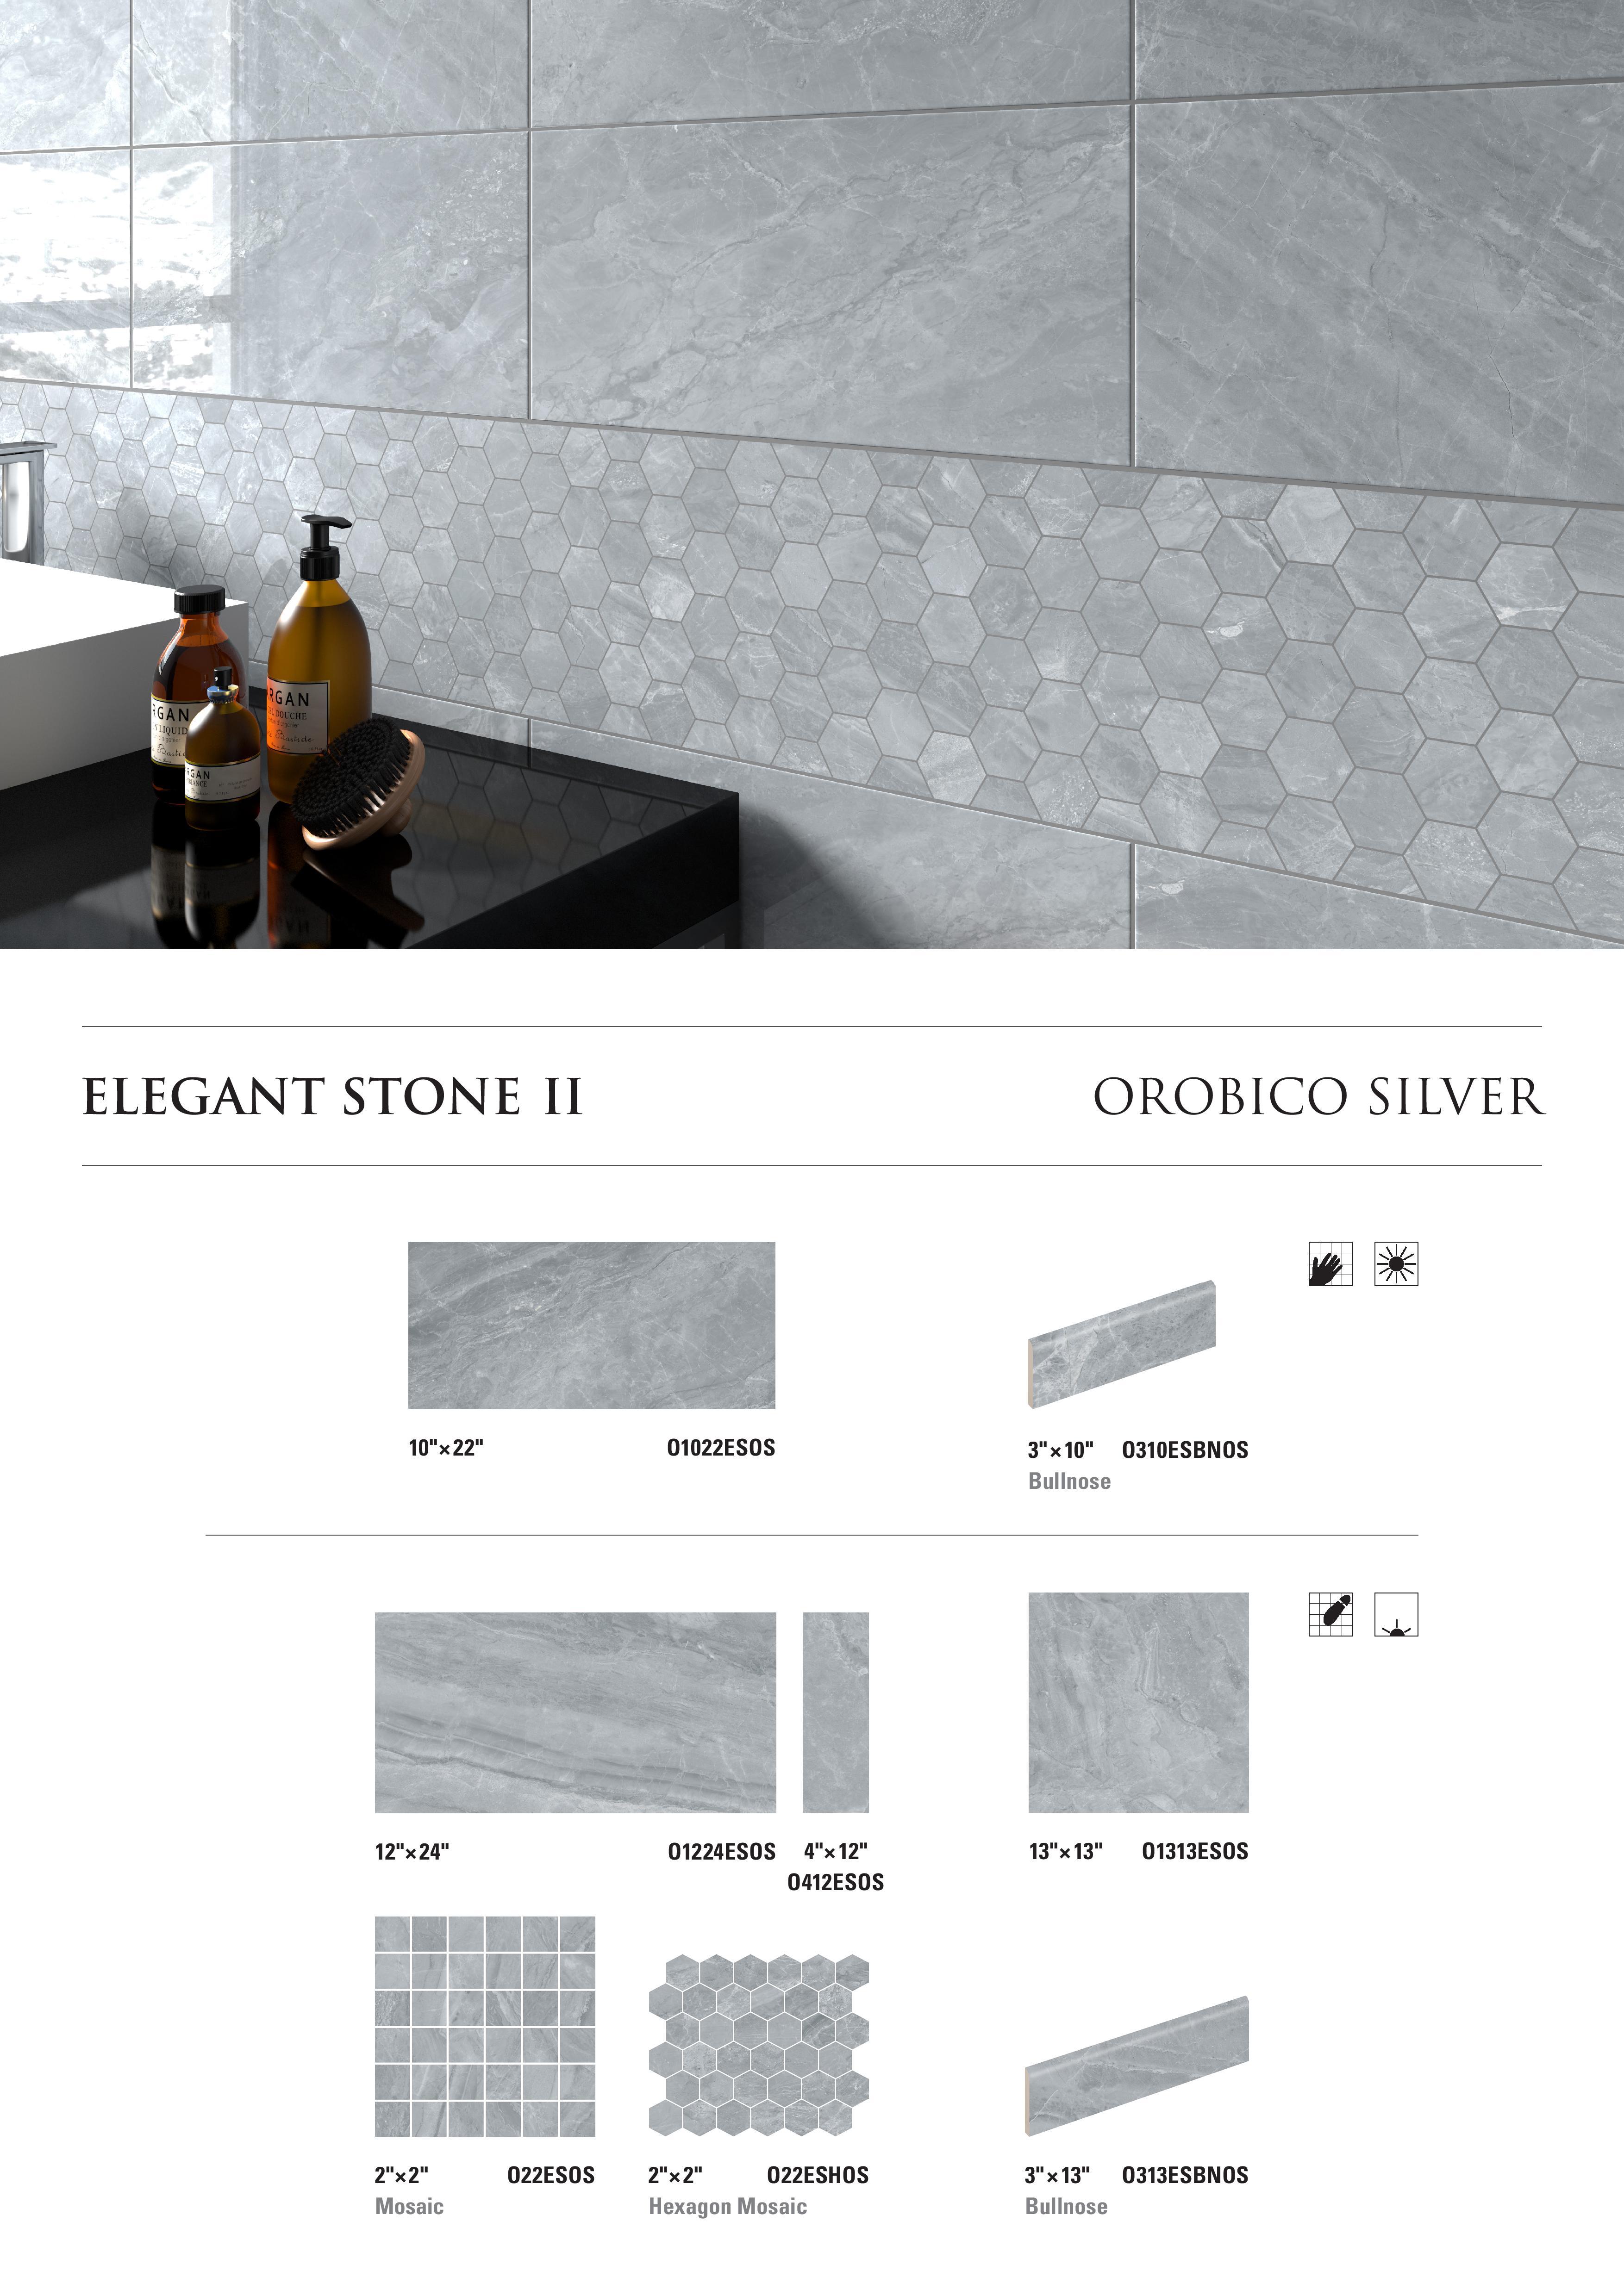 Elegant Stone II Orobico Silver by Opulenza at belktile.com